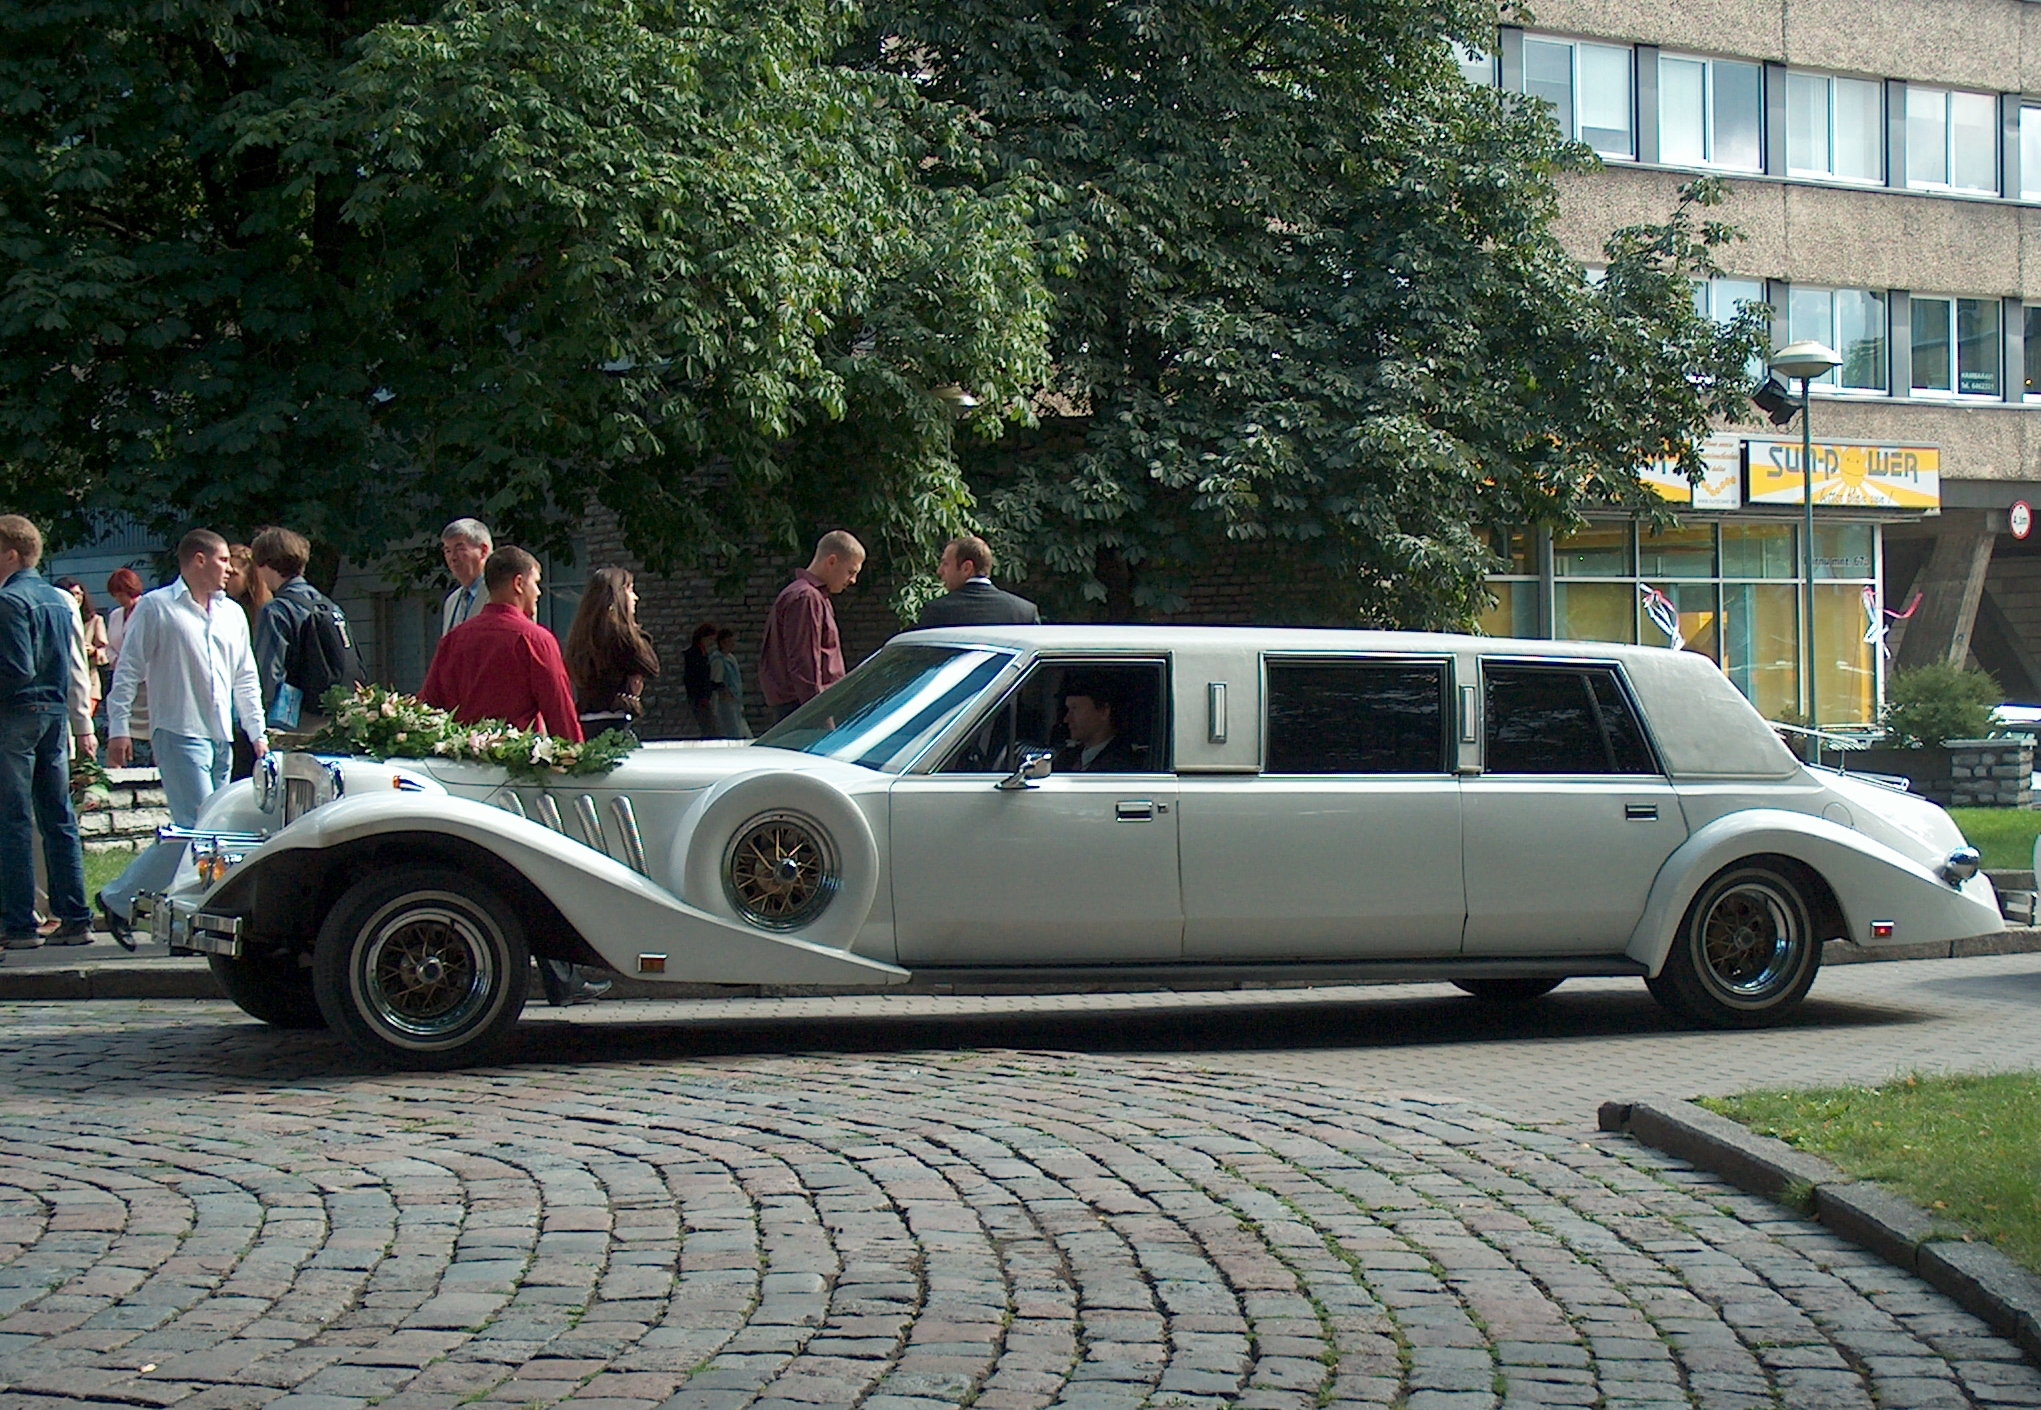 File:Wedding car in Tallinn August 2007 H2093.JPG - Wikimedia Commons